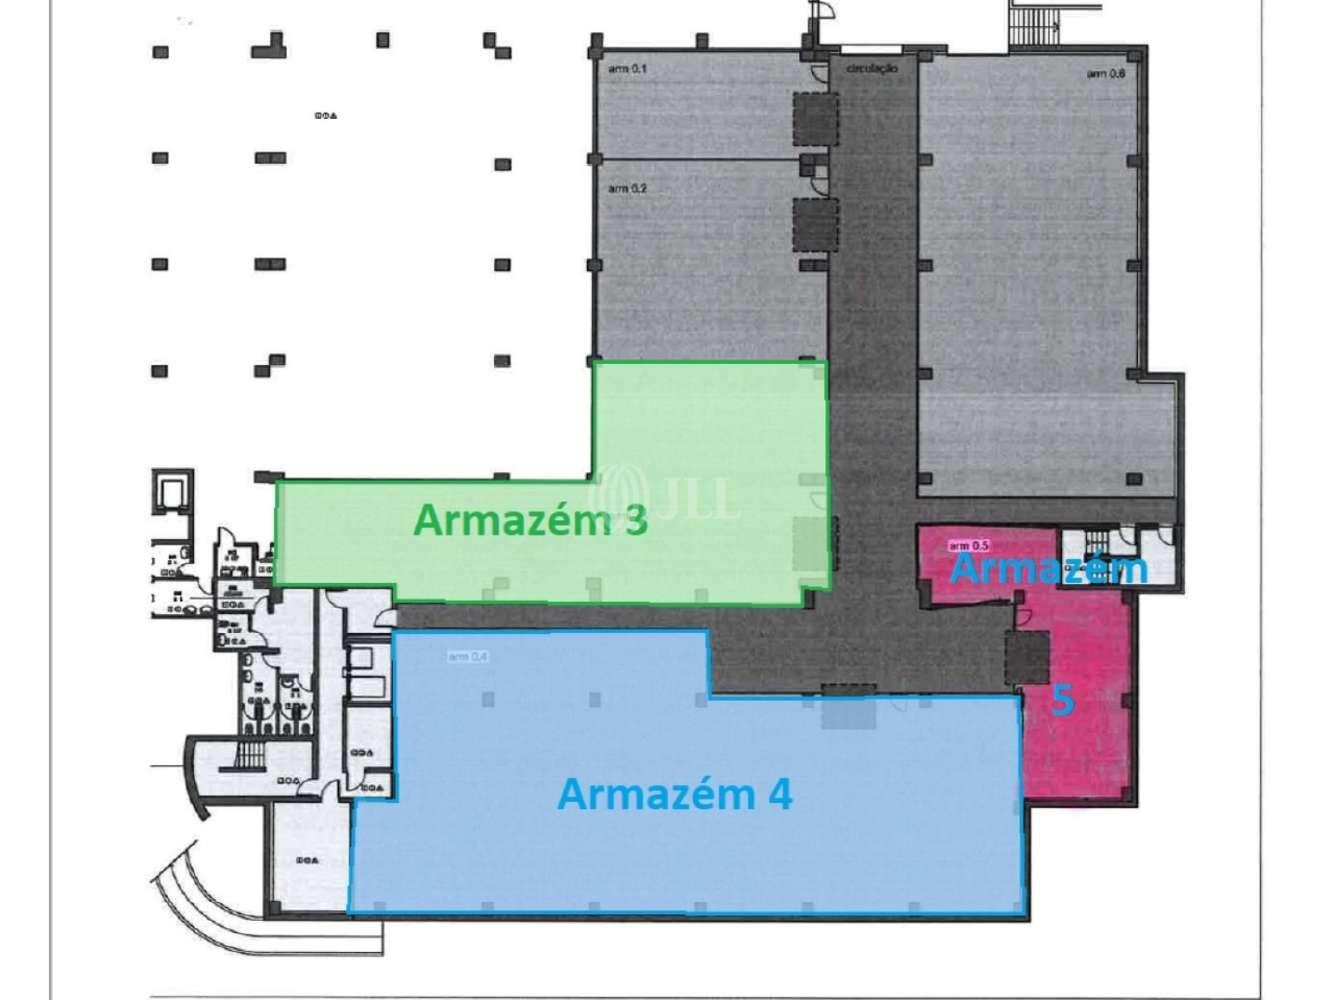 Industrial Sintra,  - Sintra Business Park 3 - (Arm/Esc)